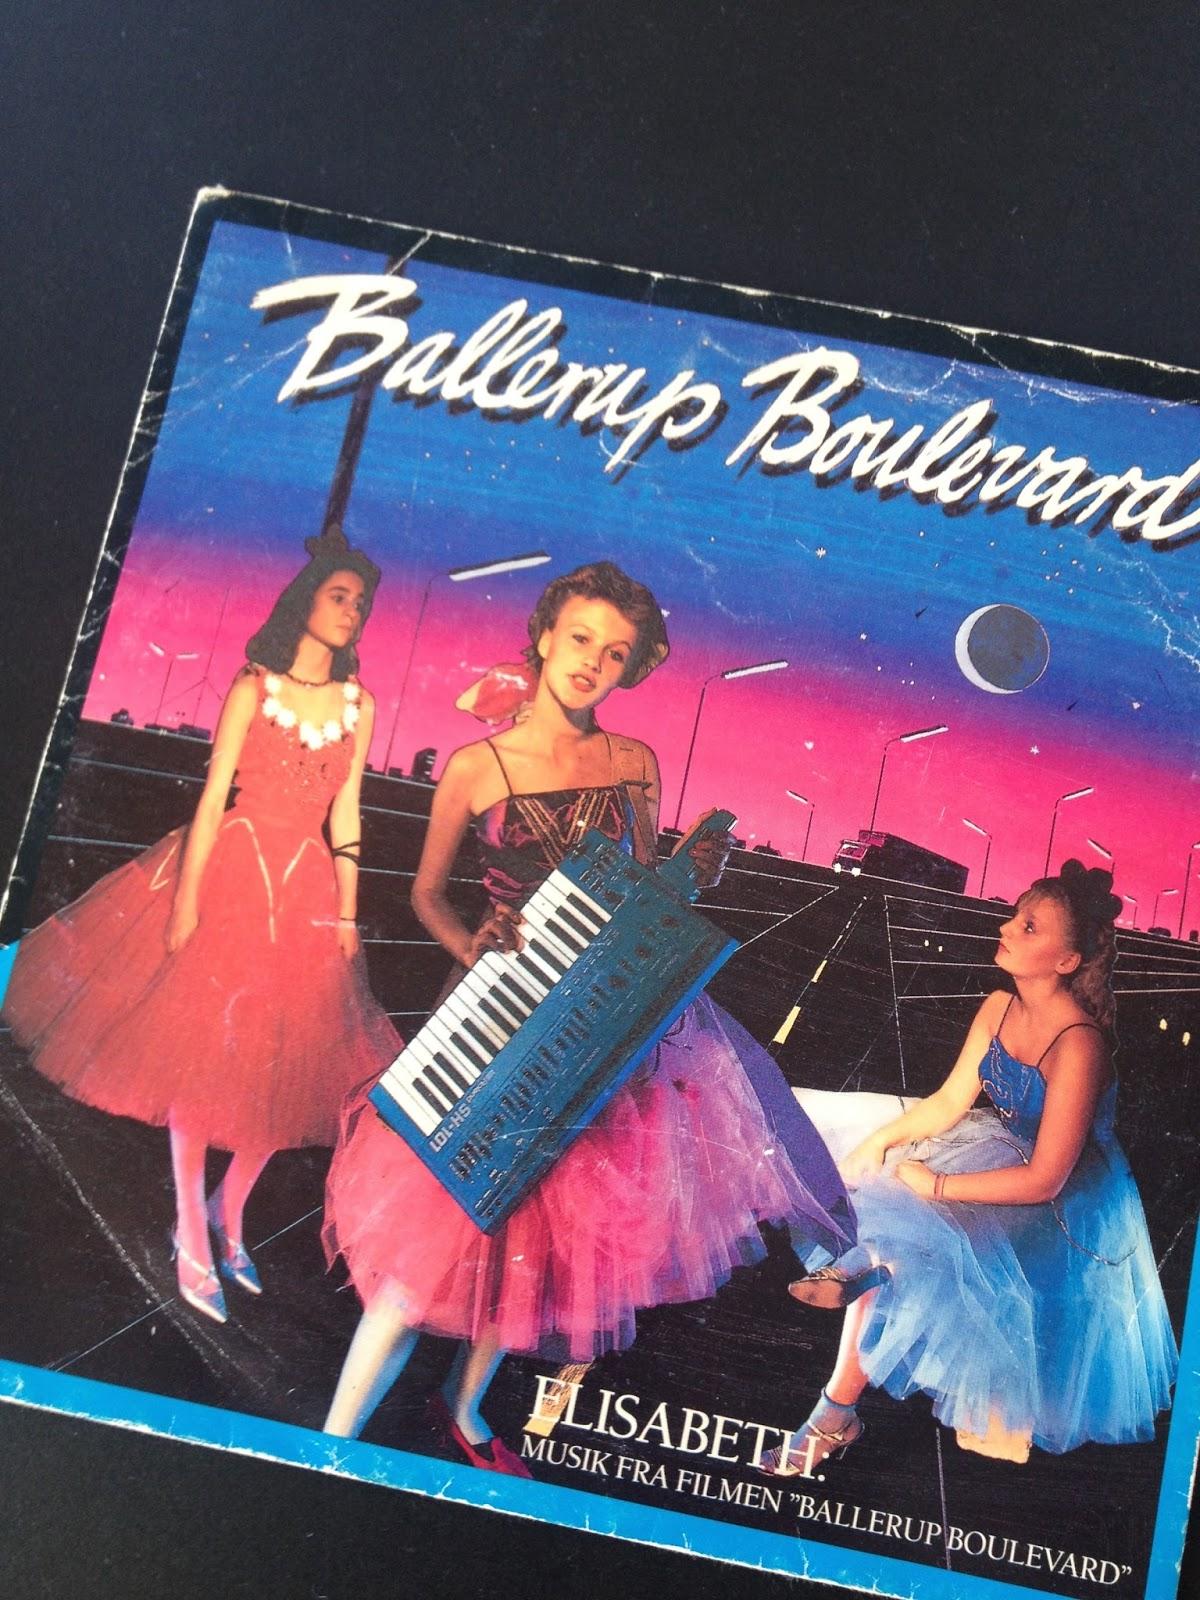 Linda Wendels blog: BALLERUP BOULEVARD på DVD # 2